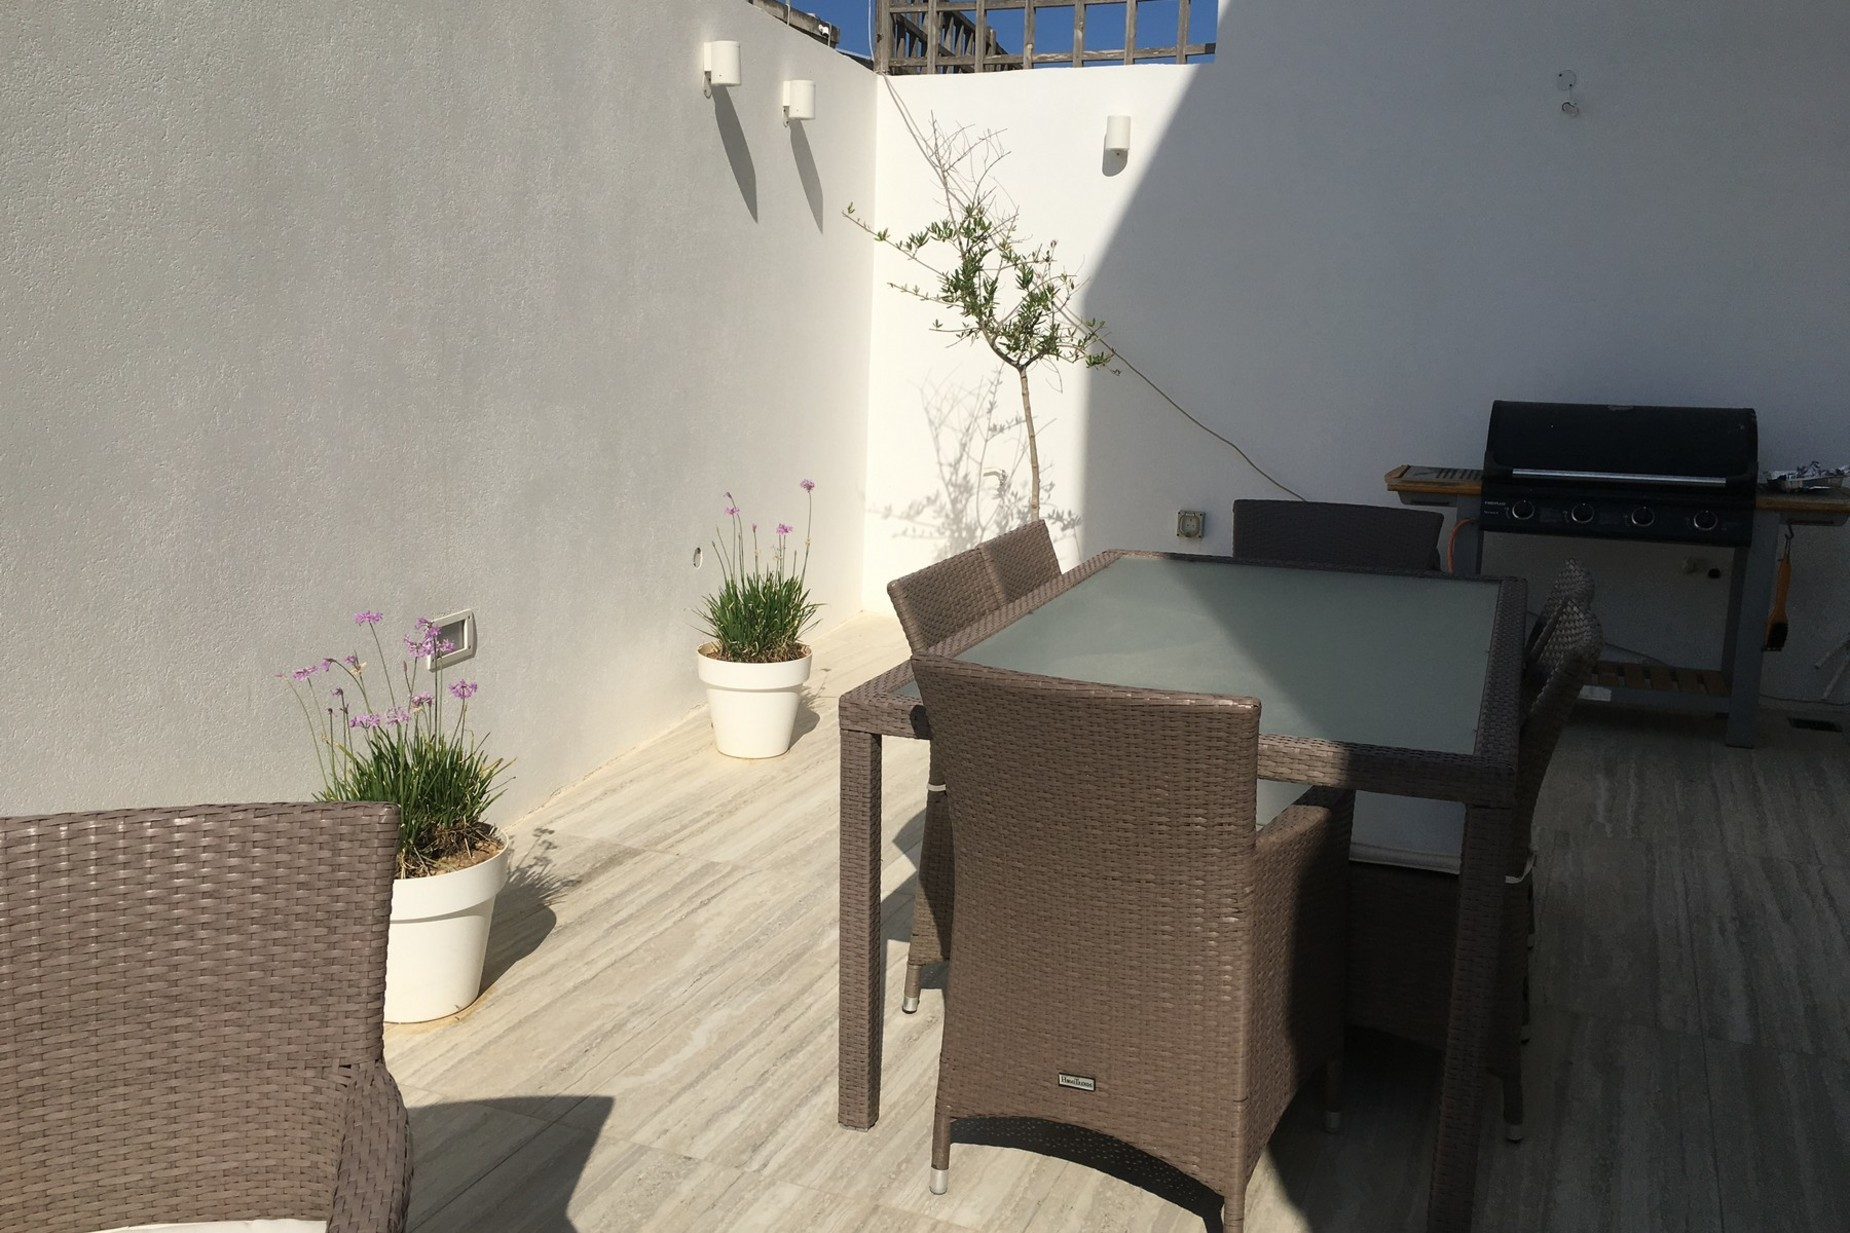 3 bed Villa For Sale in Pembroke, Pembroke - thumb 10